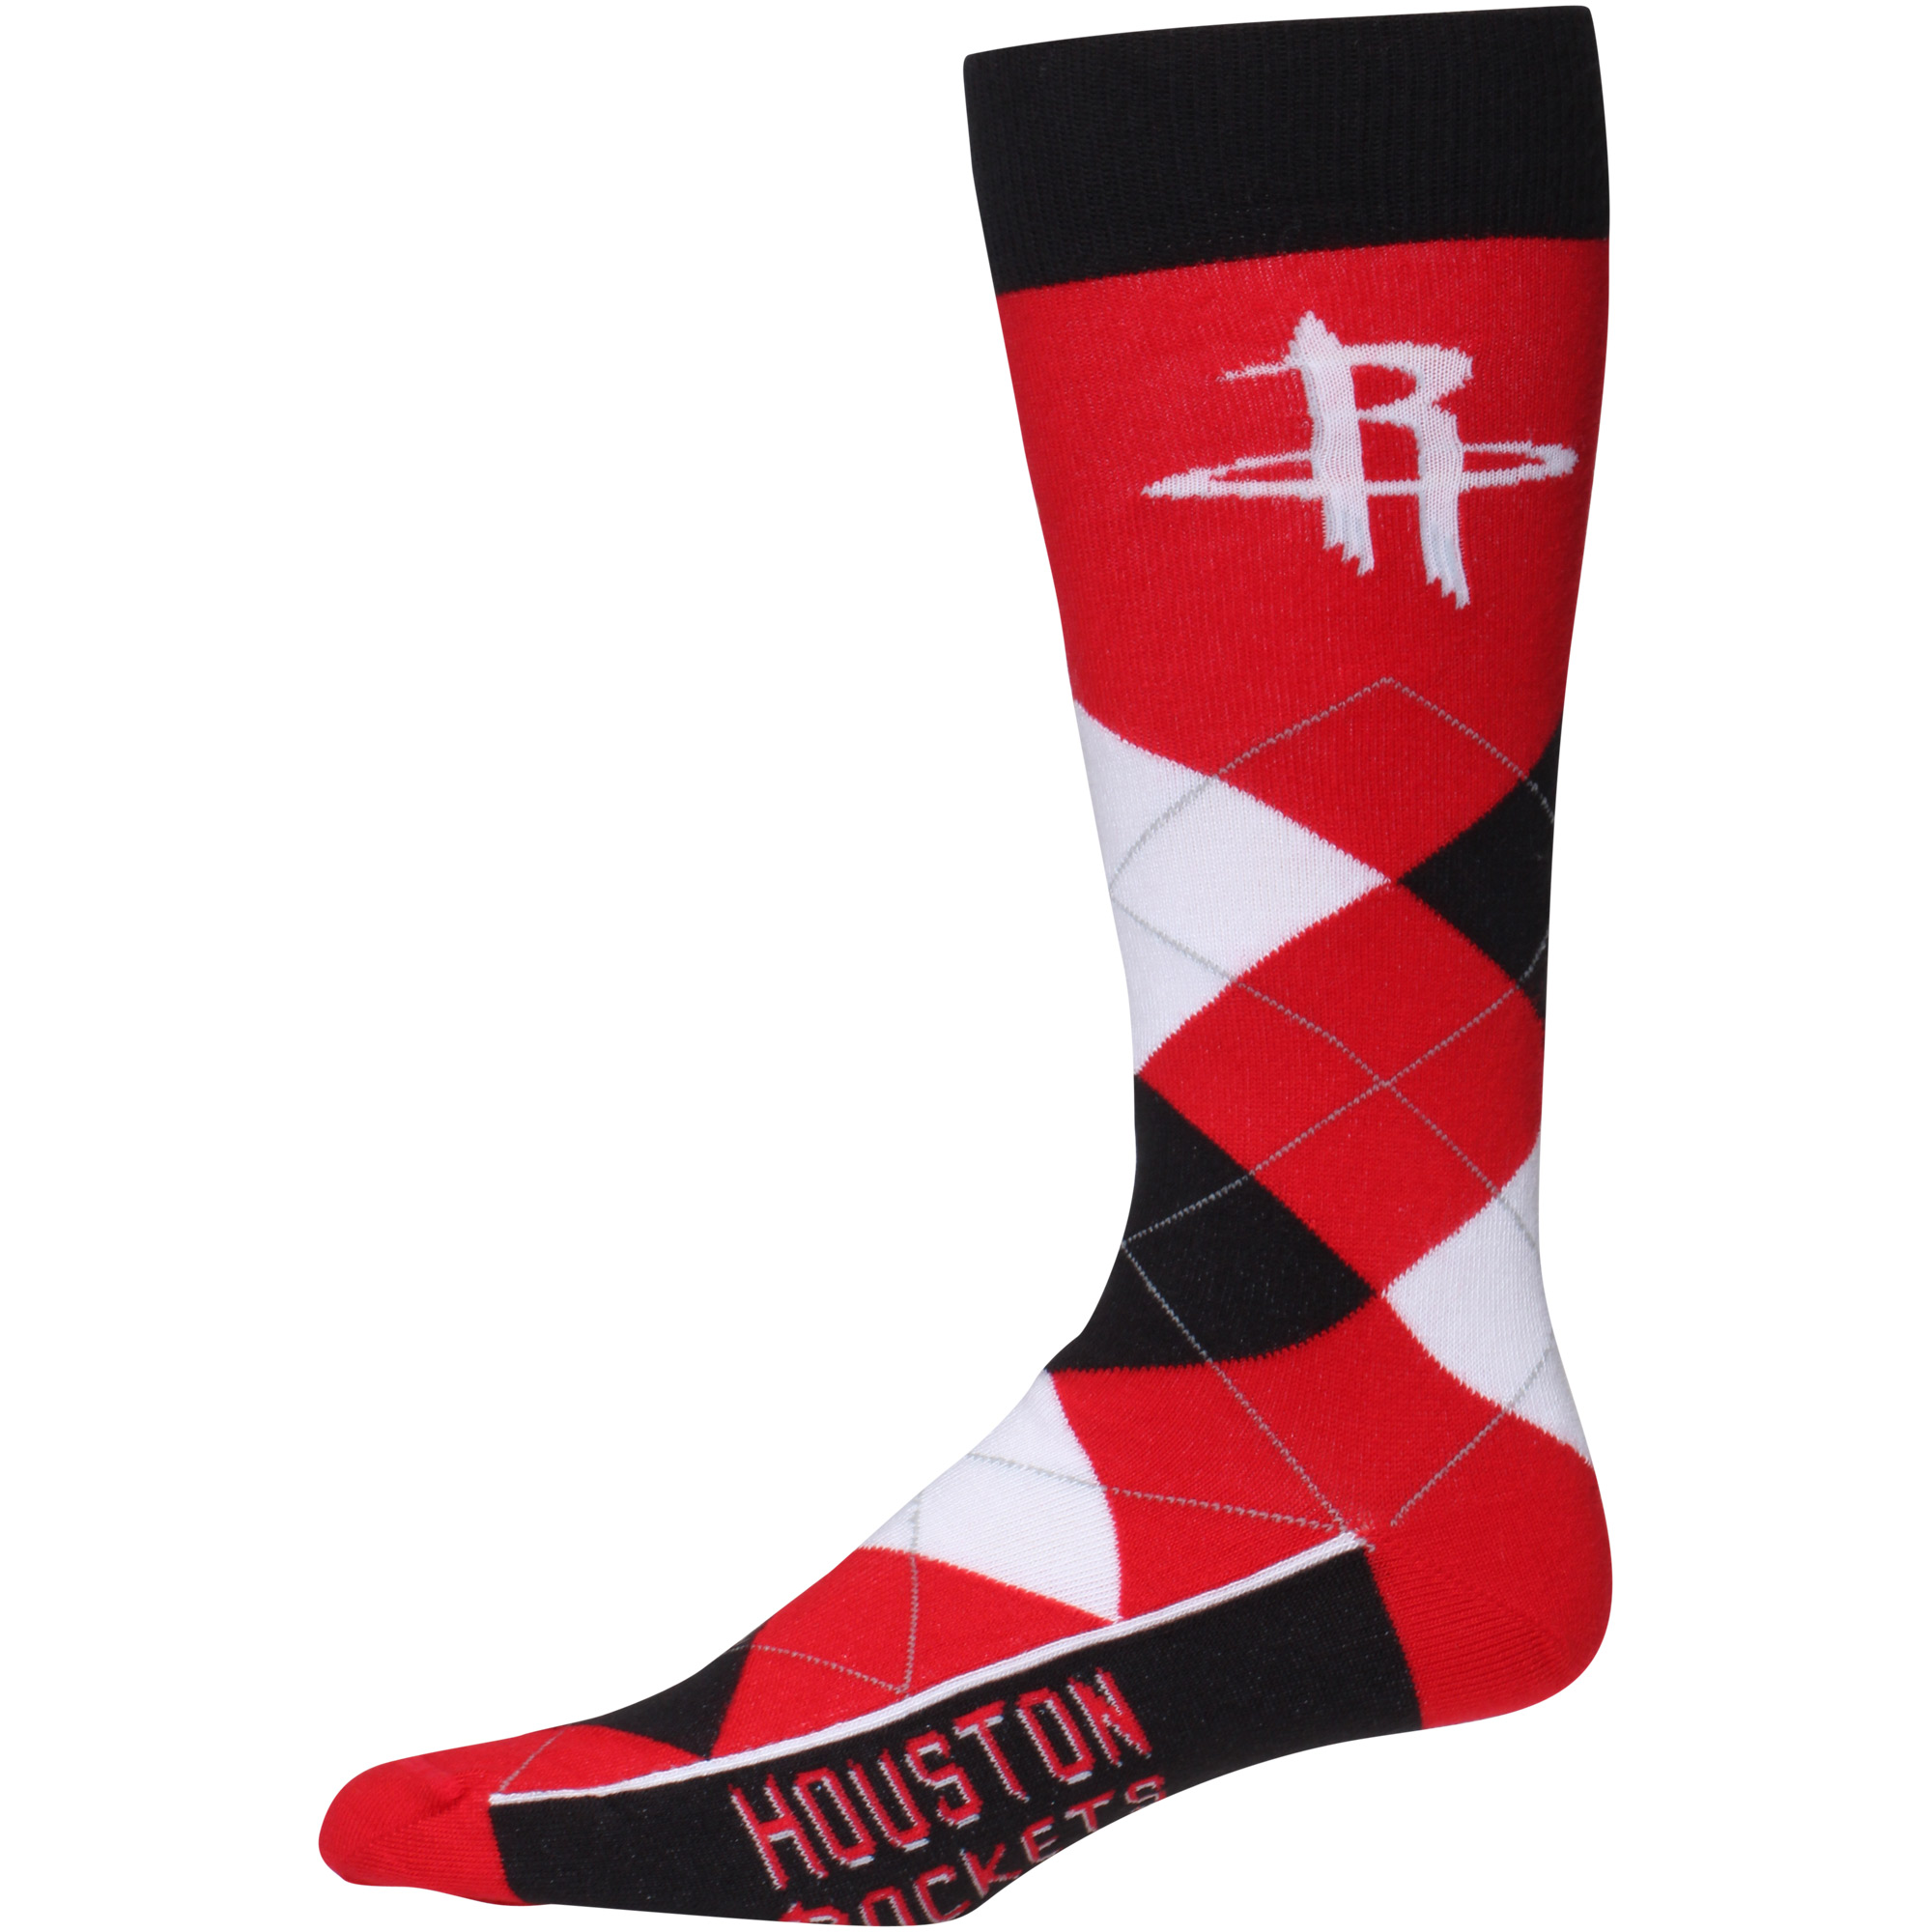 Houston Rockets For Bare Feet Argyle Crew Socks - No Size